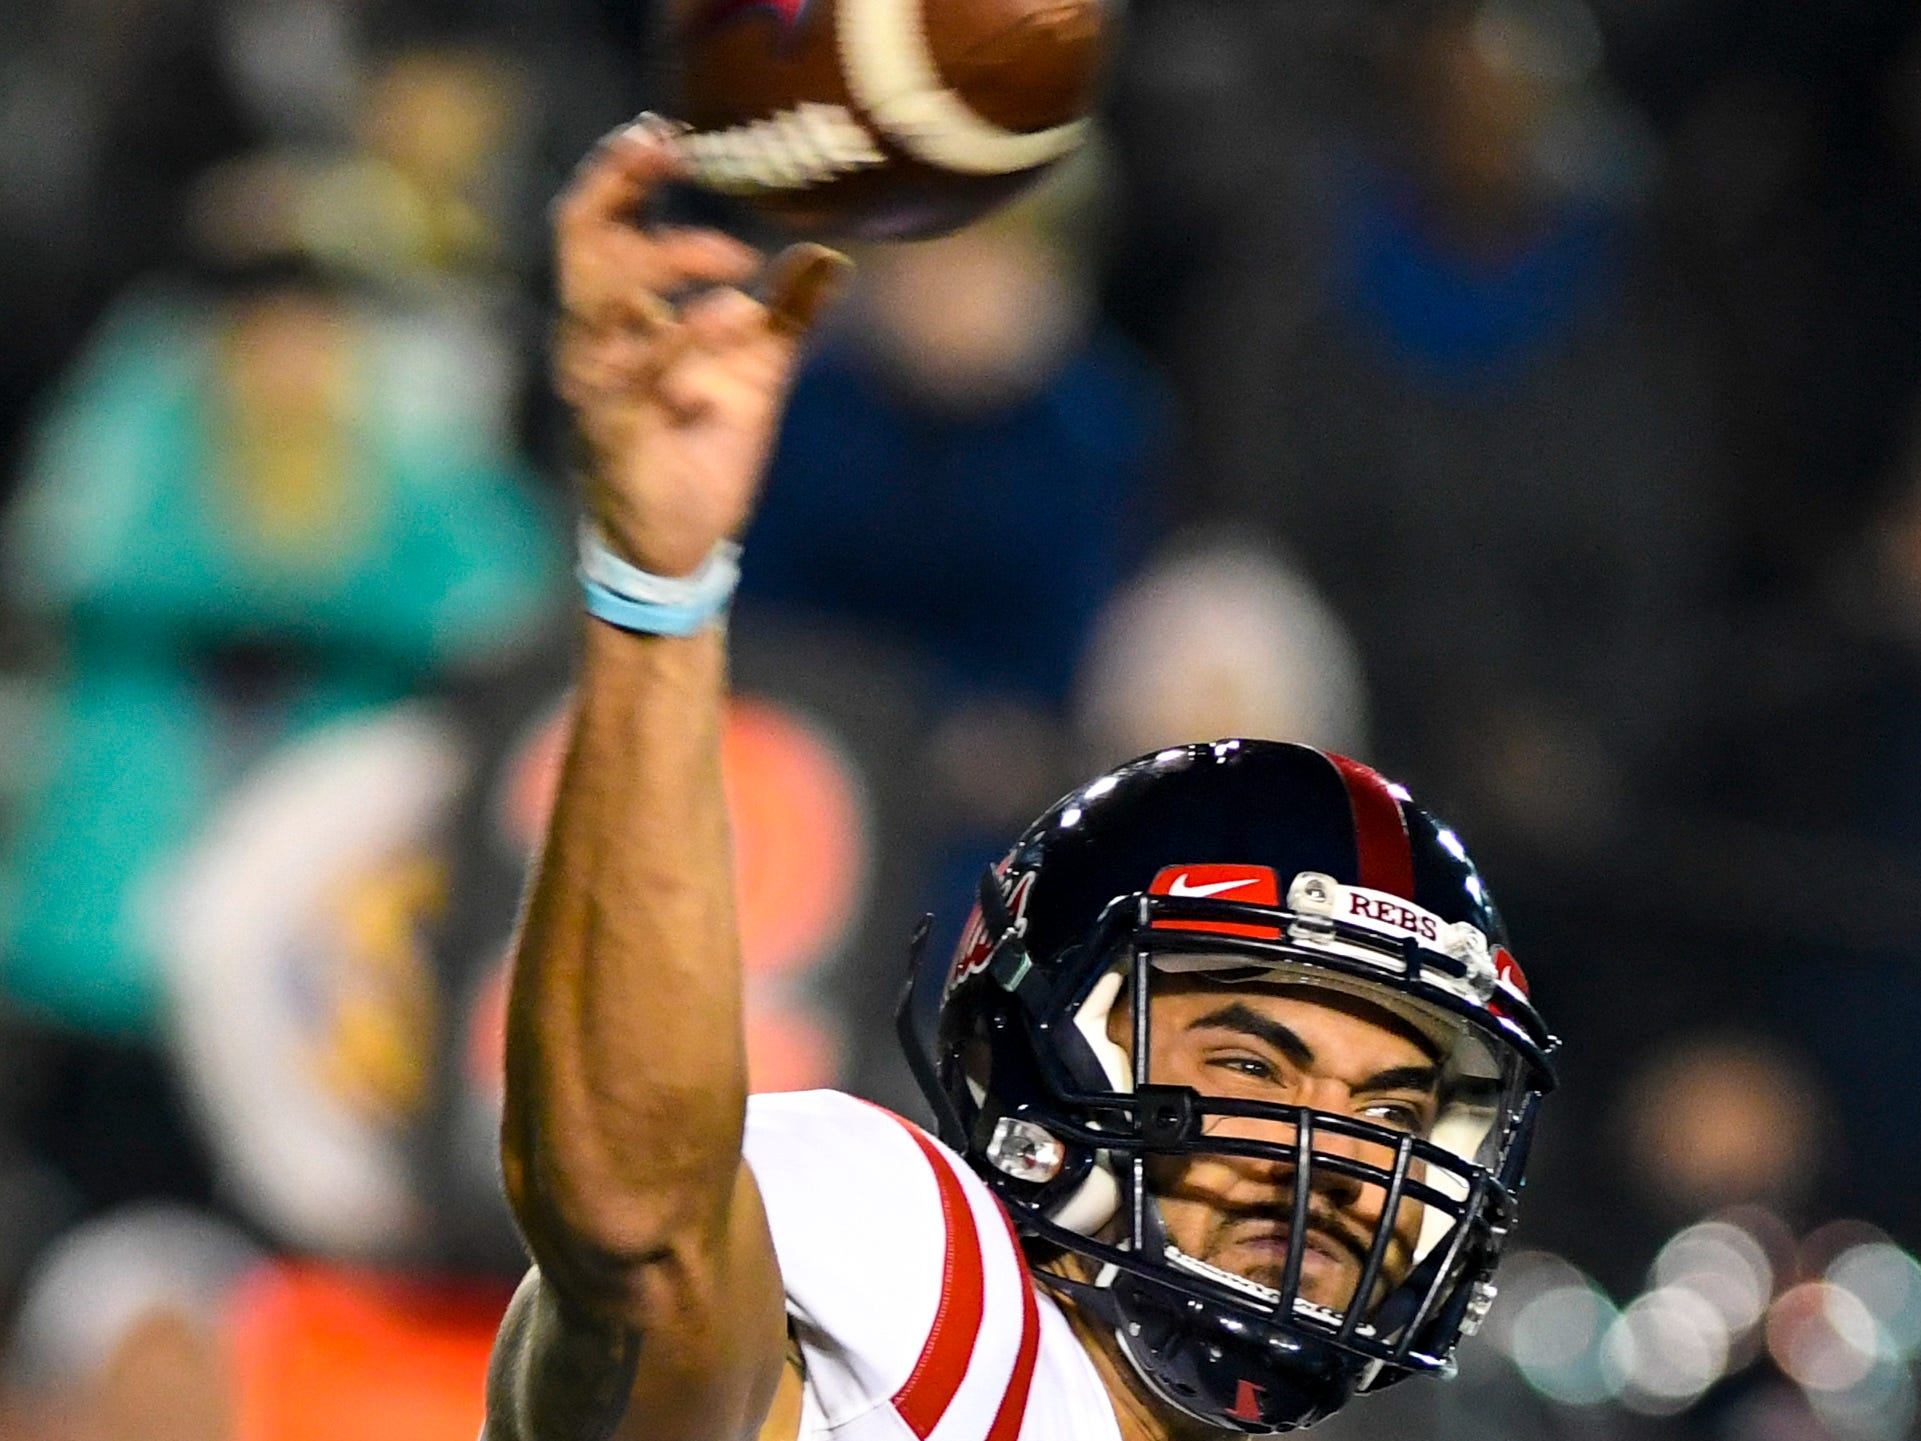 Ole Miss quarterback Jordan Ta'amu (10) passes during Vanderbilt's game against Ole Miss at Vanderbilt Stadium in Nashville on Saturday, Nov. 17, 2018.